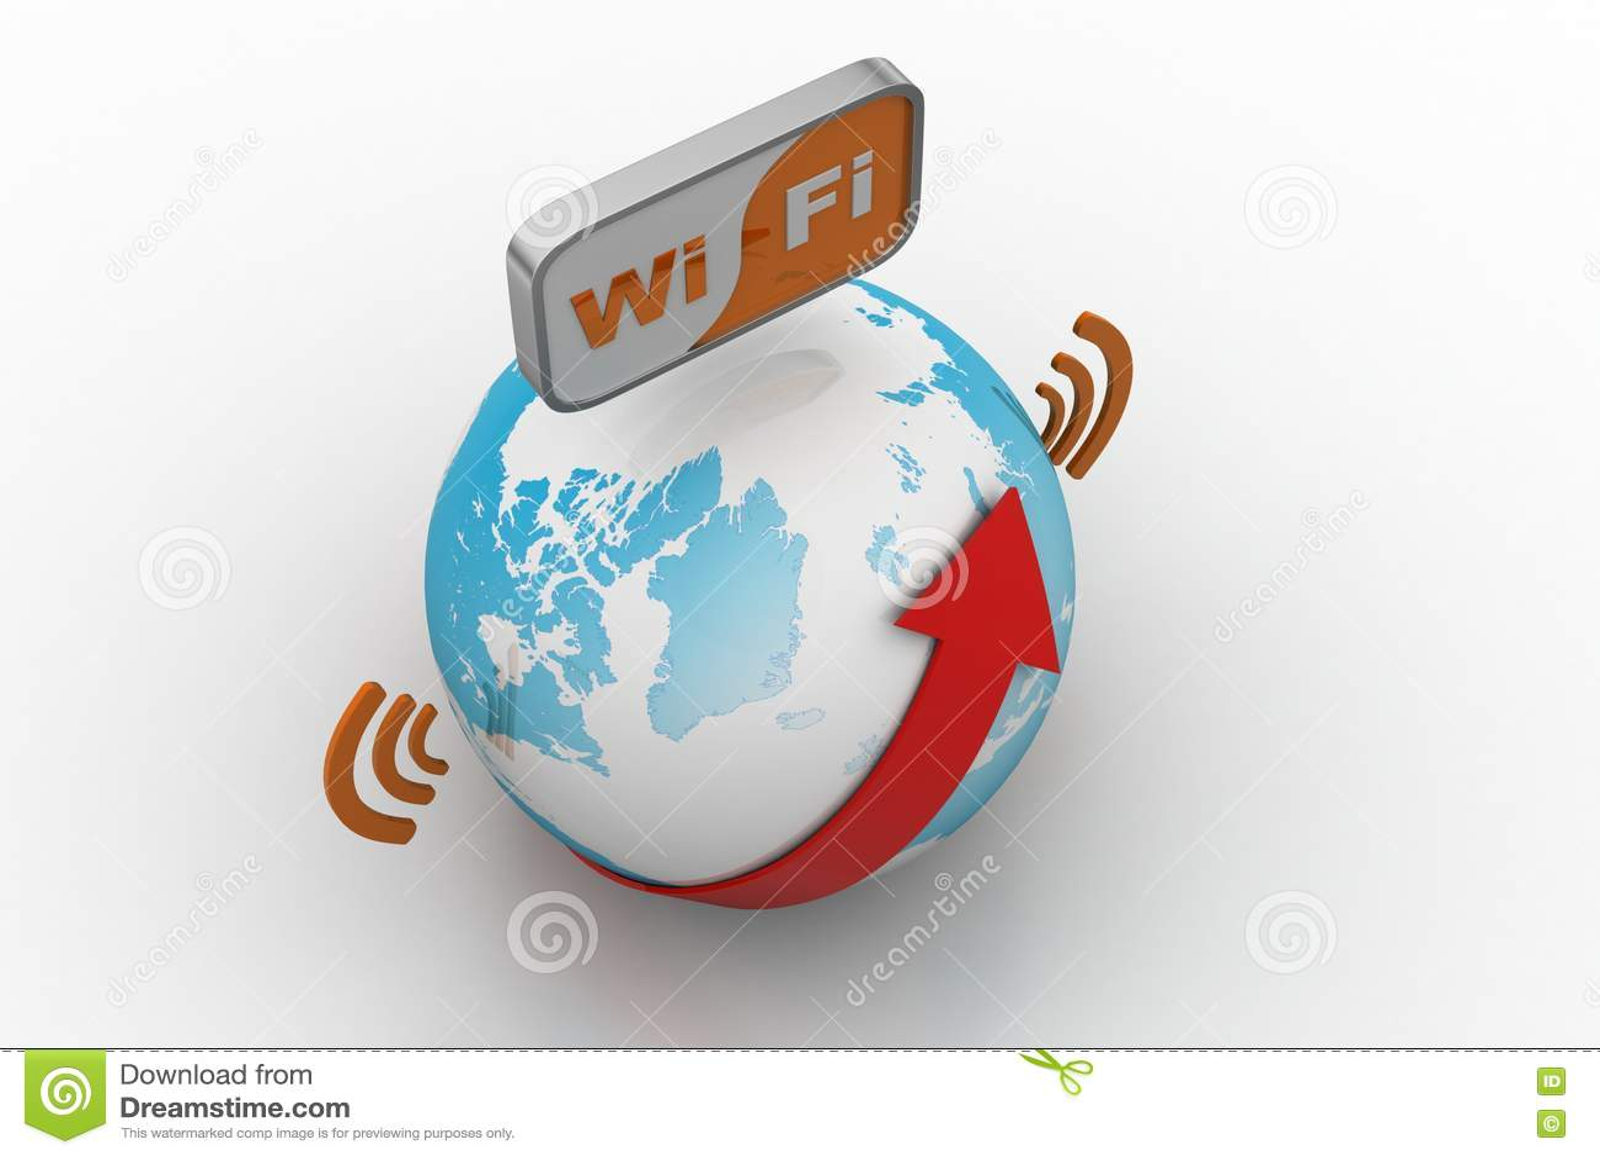 World wifi Earth broadband symbol